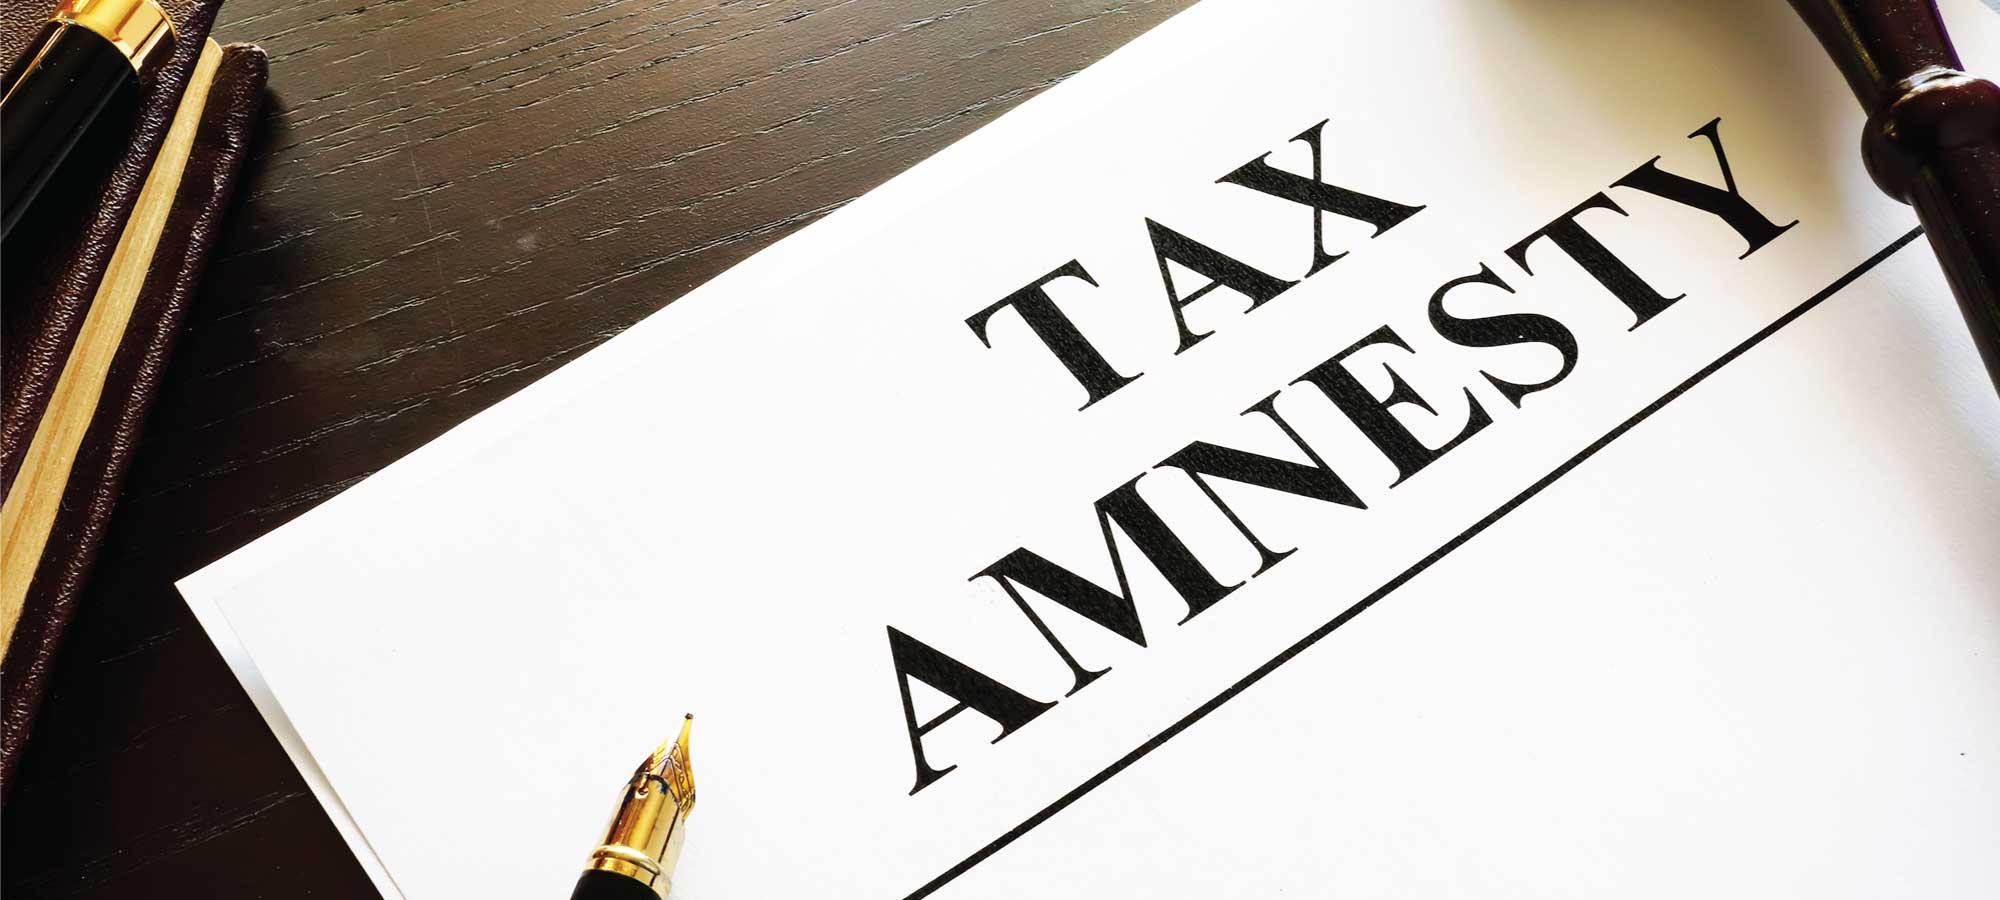 Tujuan Tax Amnesty